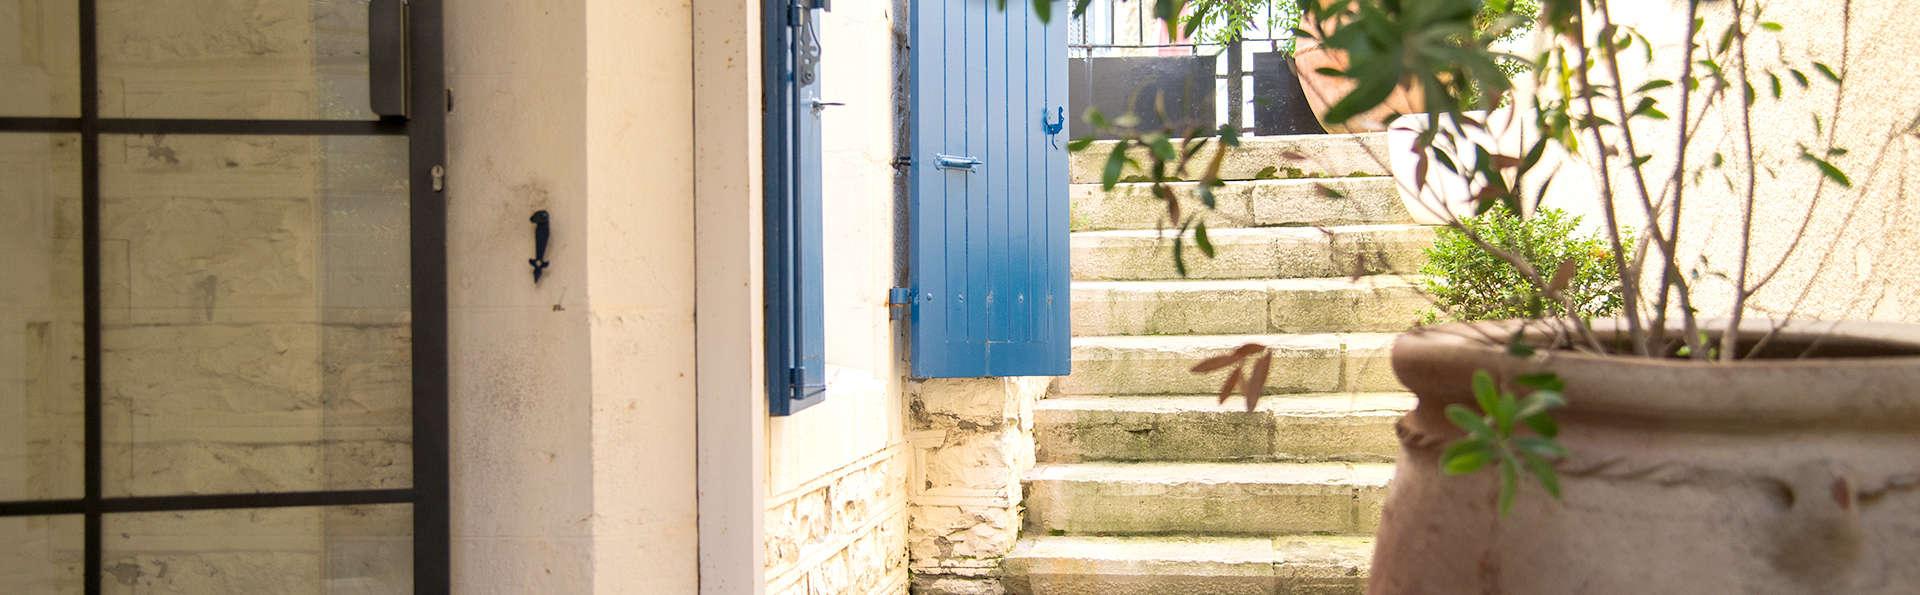 Hôtel Edouard VII Biarritz - Edit_Entrance.jpg